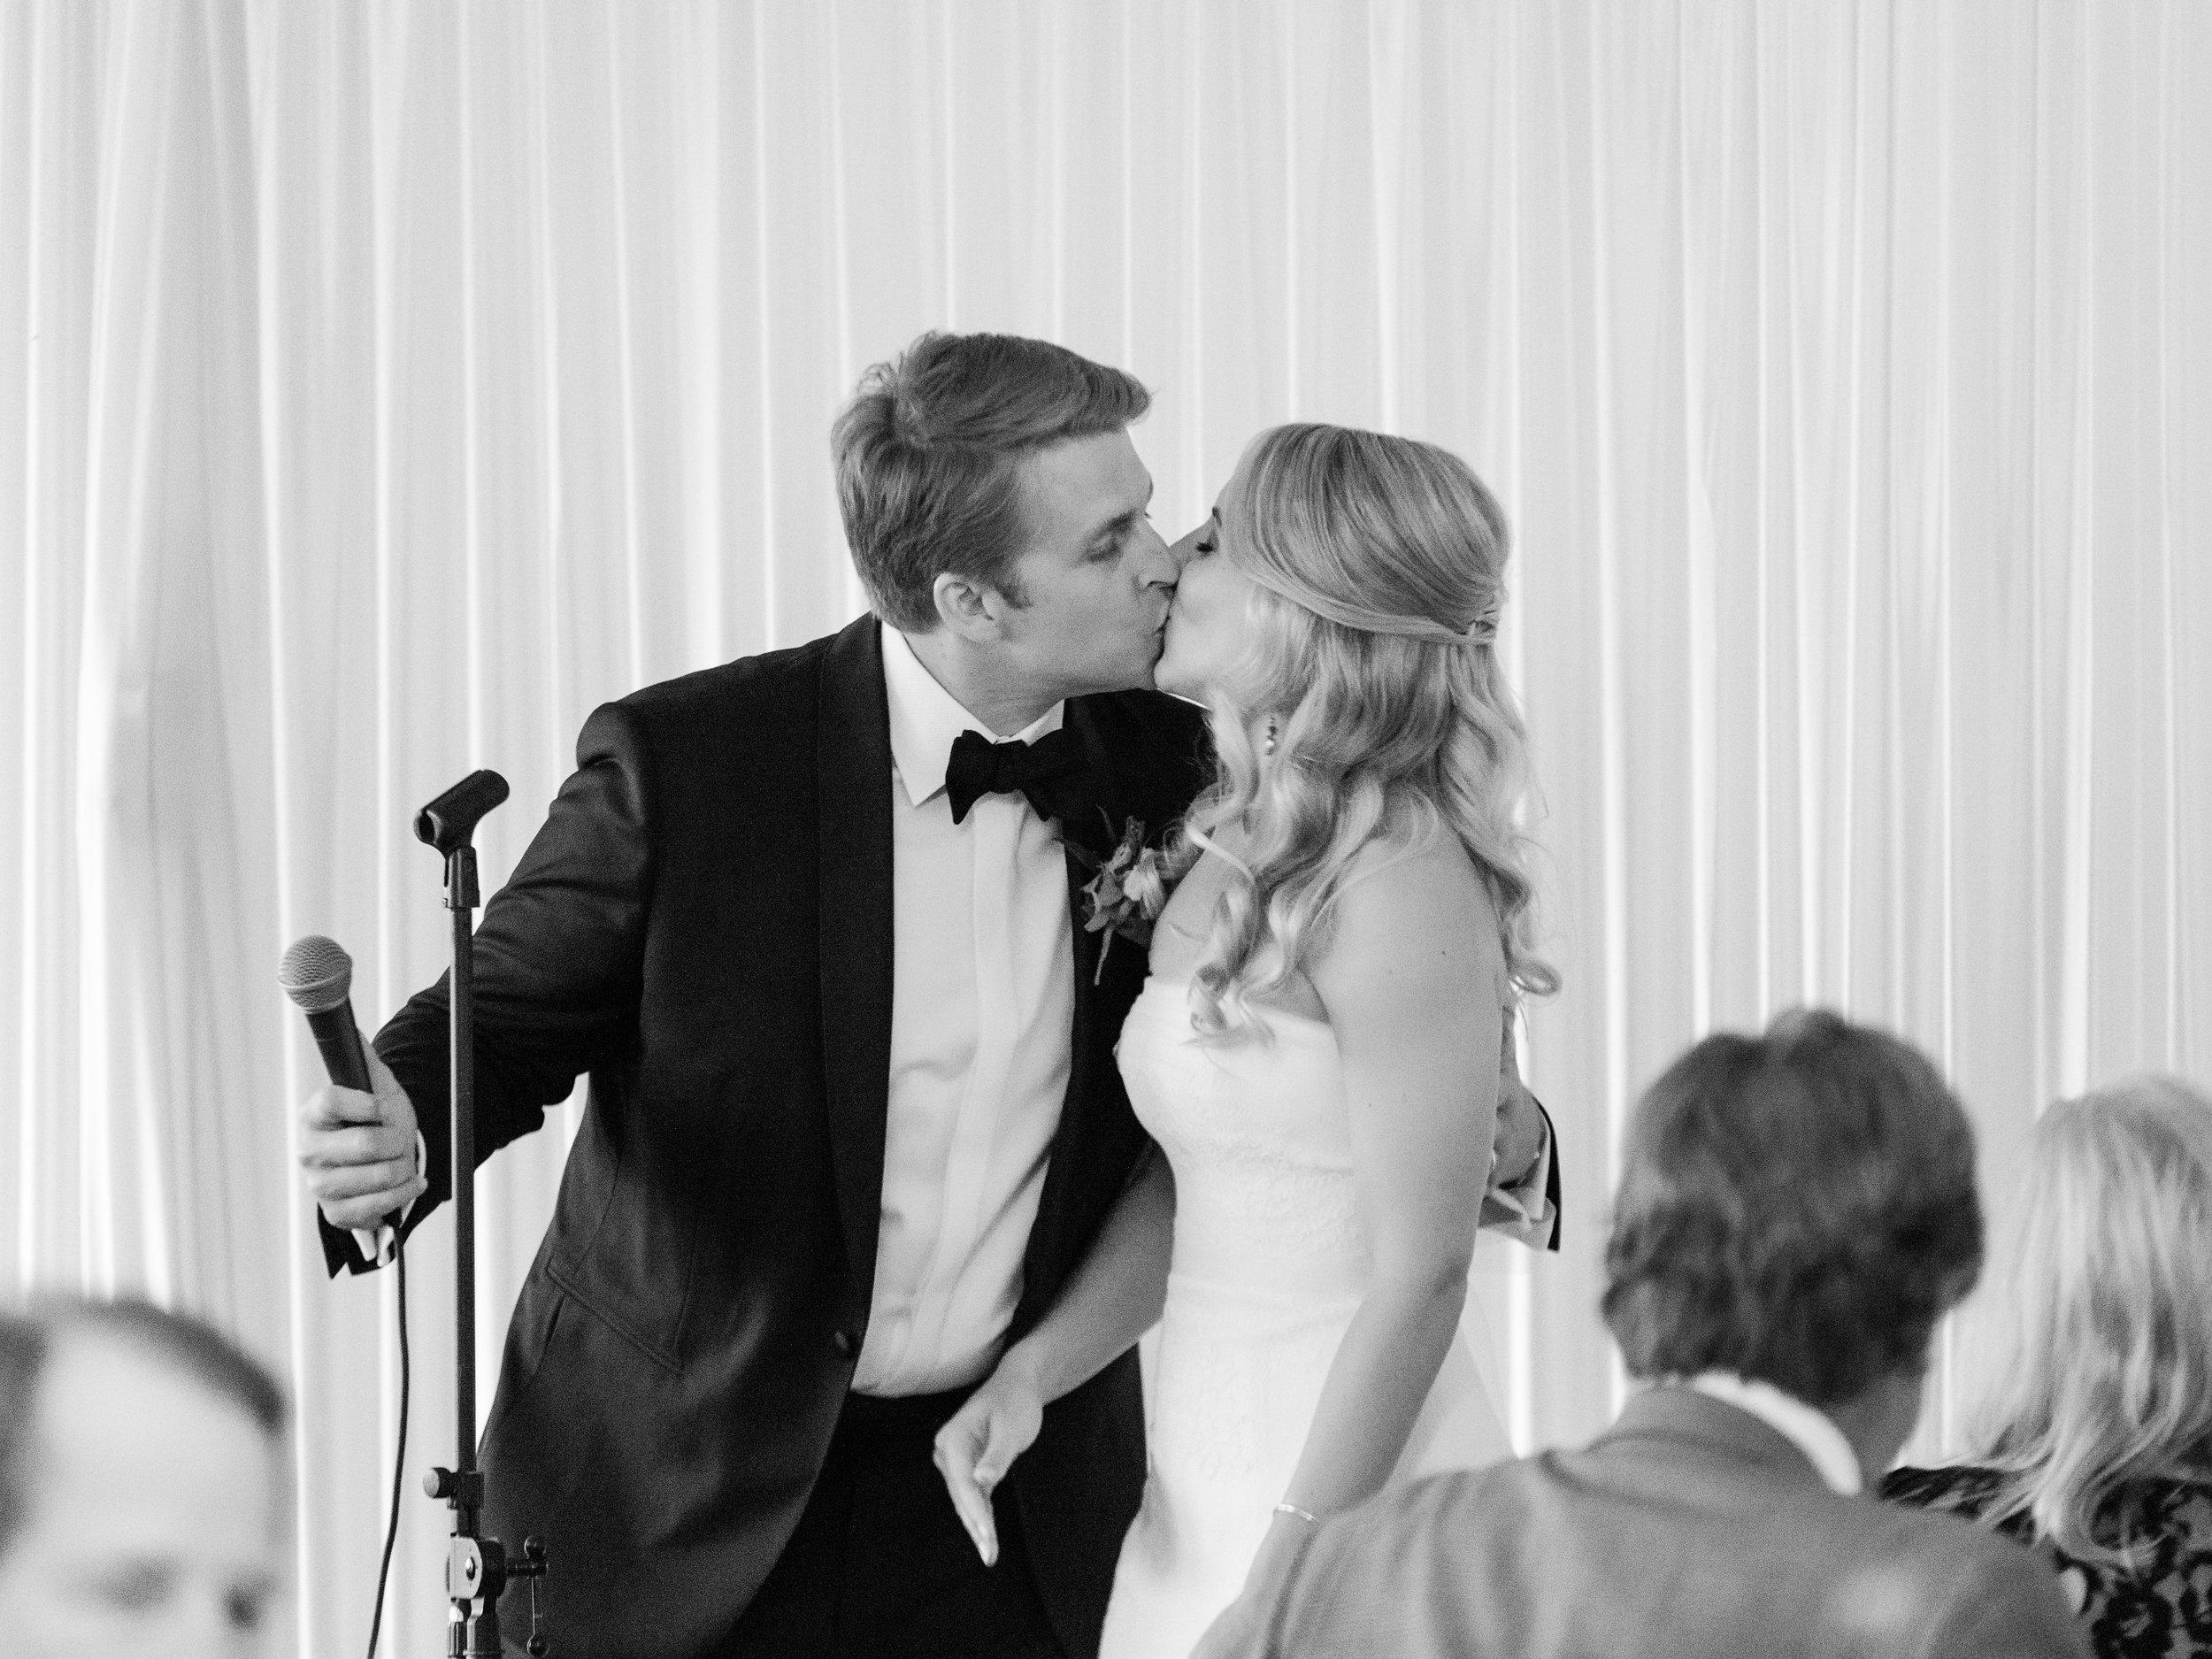 Coffman+Wedding+reception-171.jpg